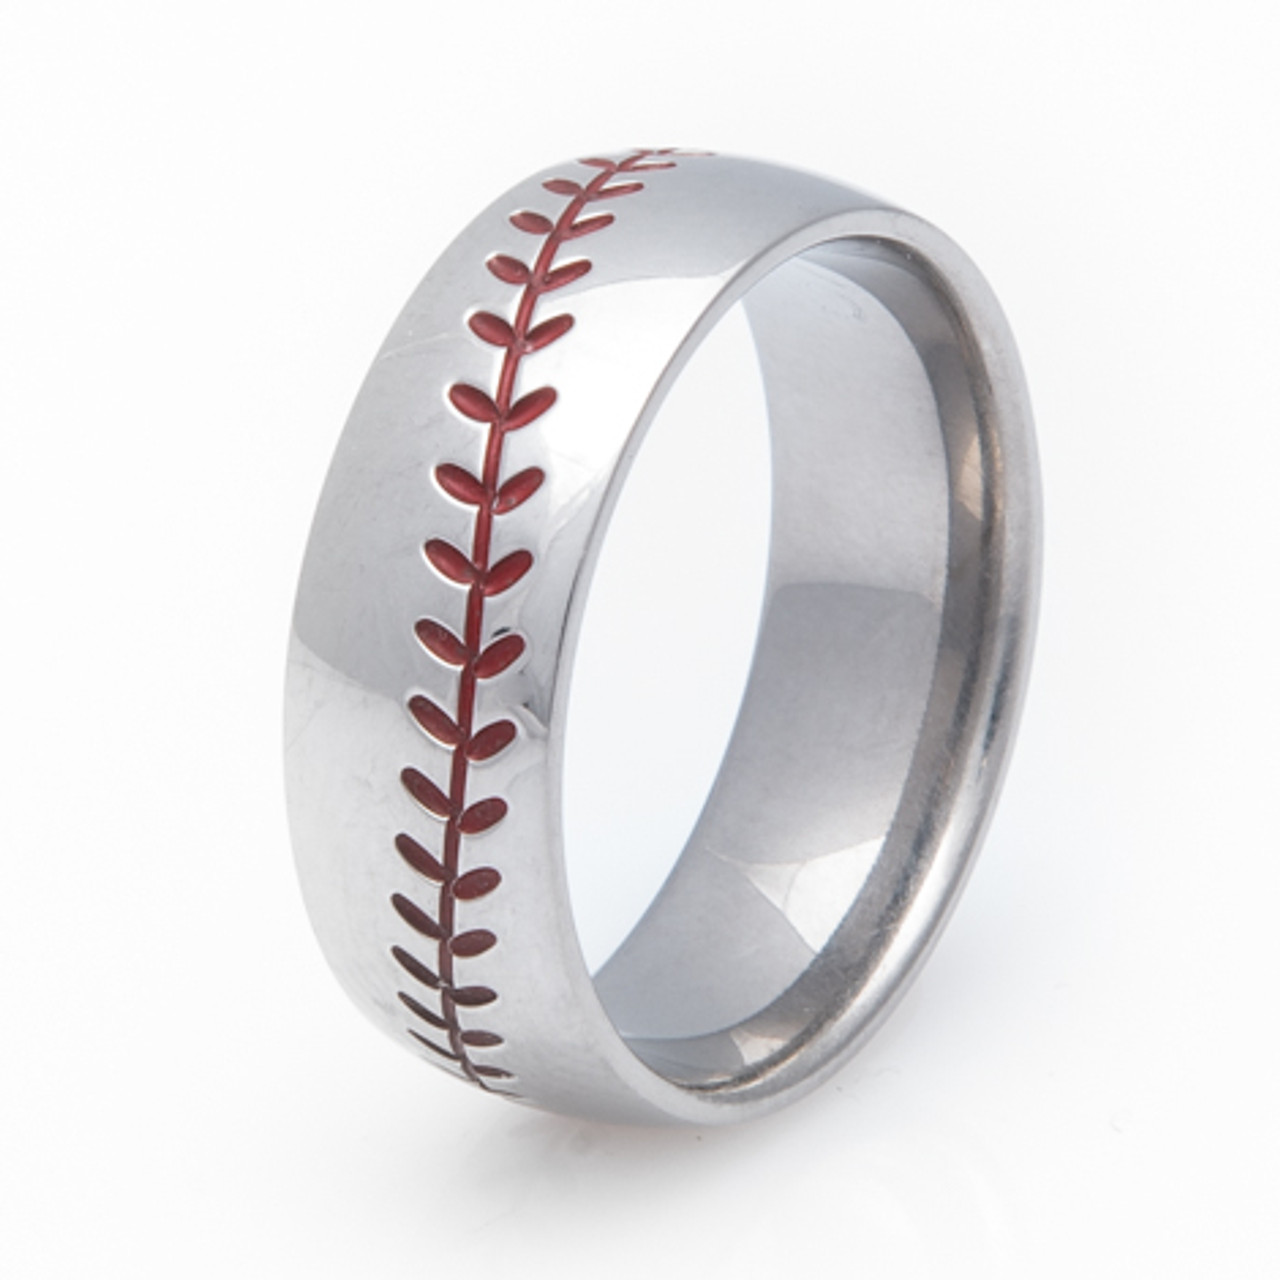 Men S Wedding Ring.Men S Titanium Baseball Wedding Ring With Color Stitching